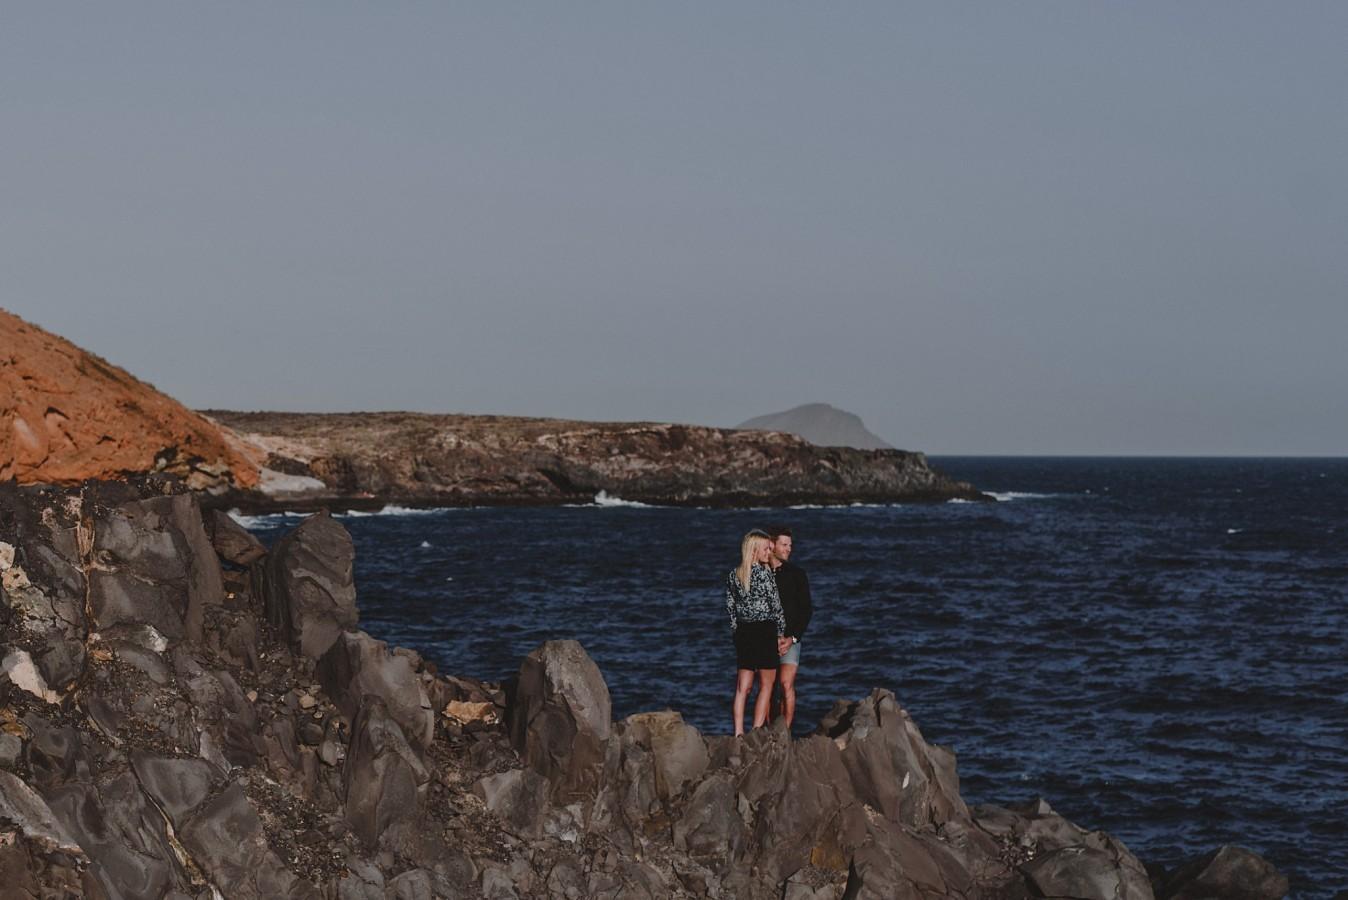 engagment-photo-shoot-tenerife-gran-canaria-photography-wedding-3647